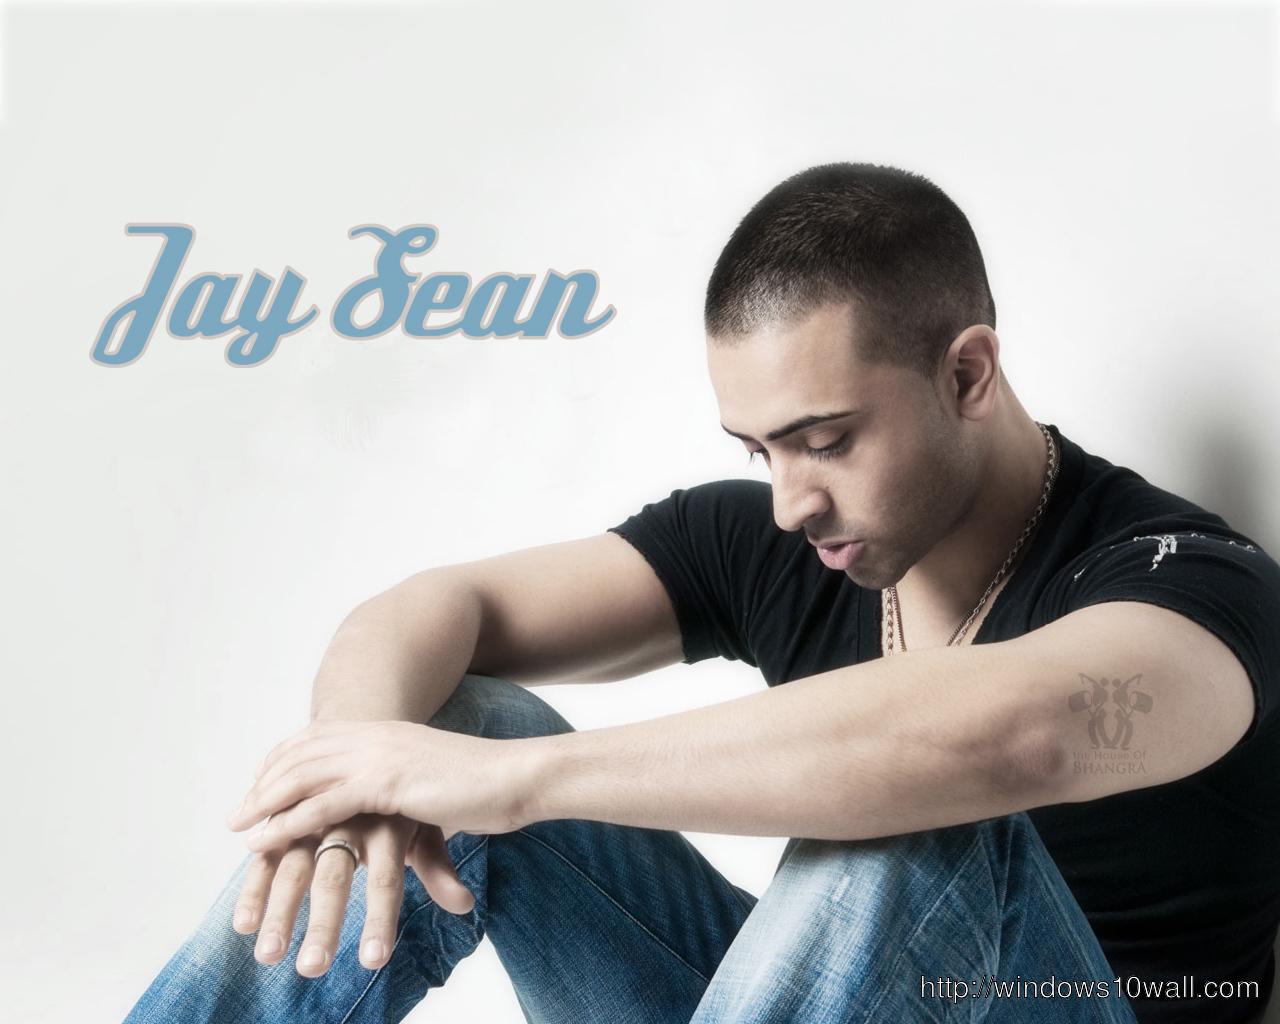 Jay Sean Wallpapers Hd Jay Sean Hd Background...